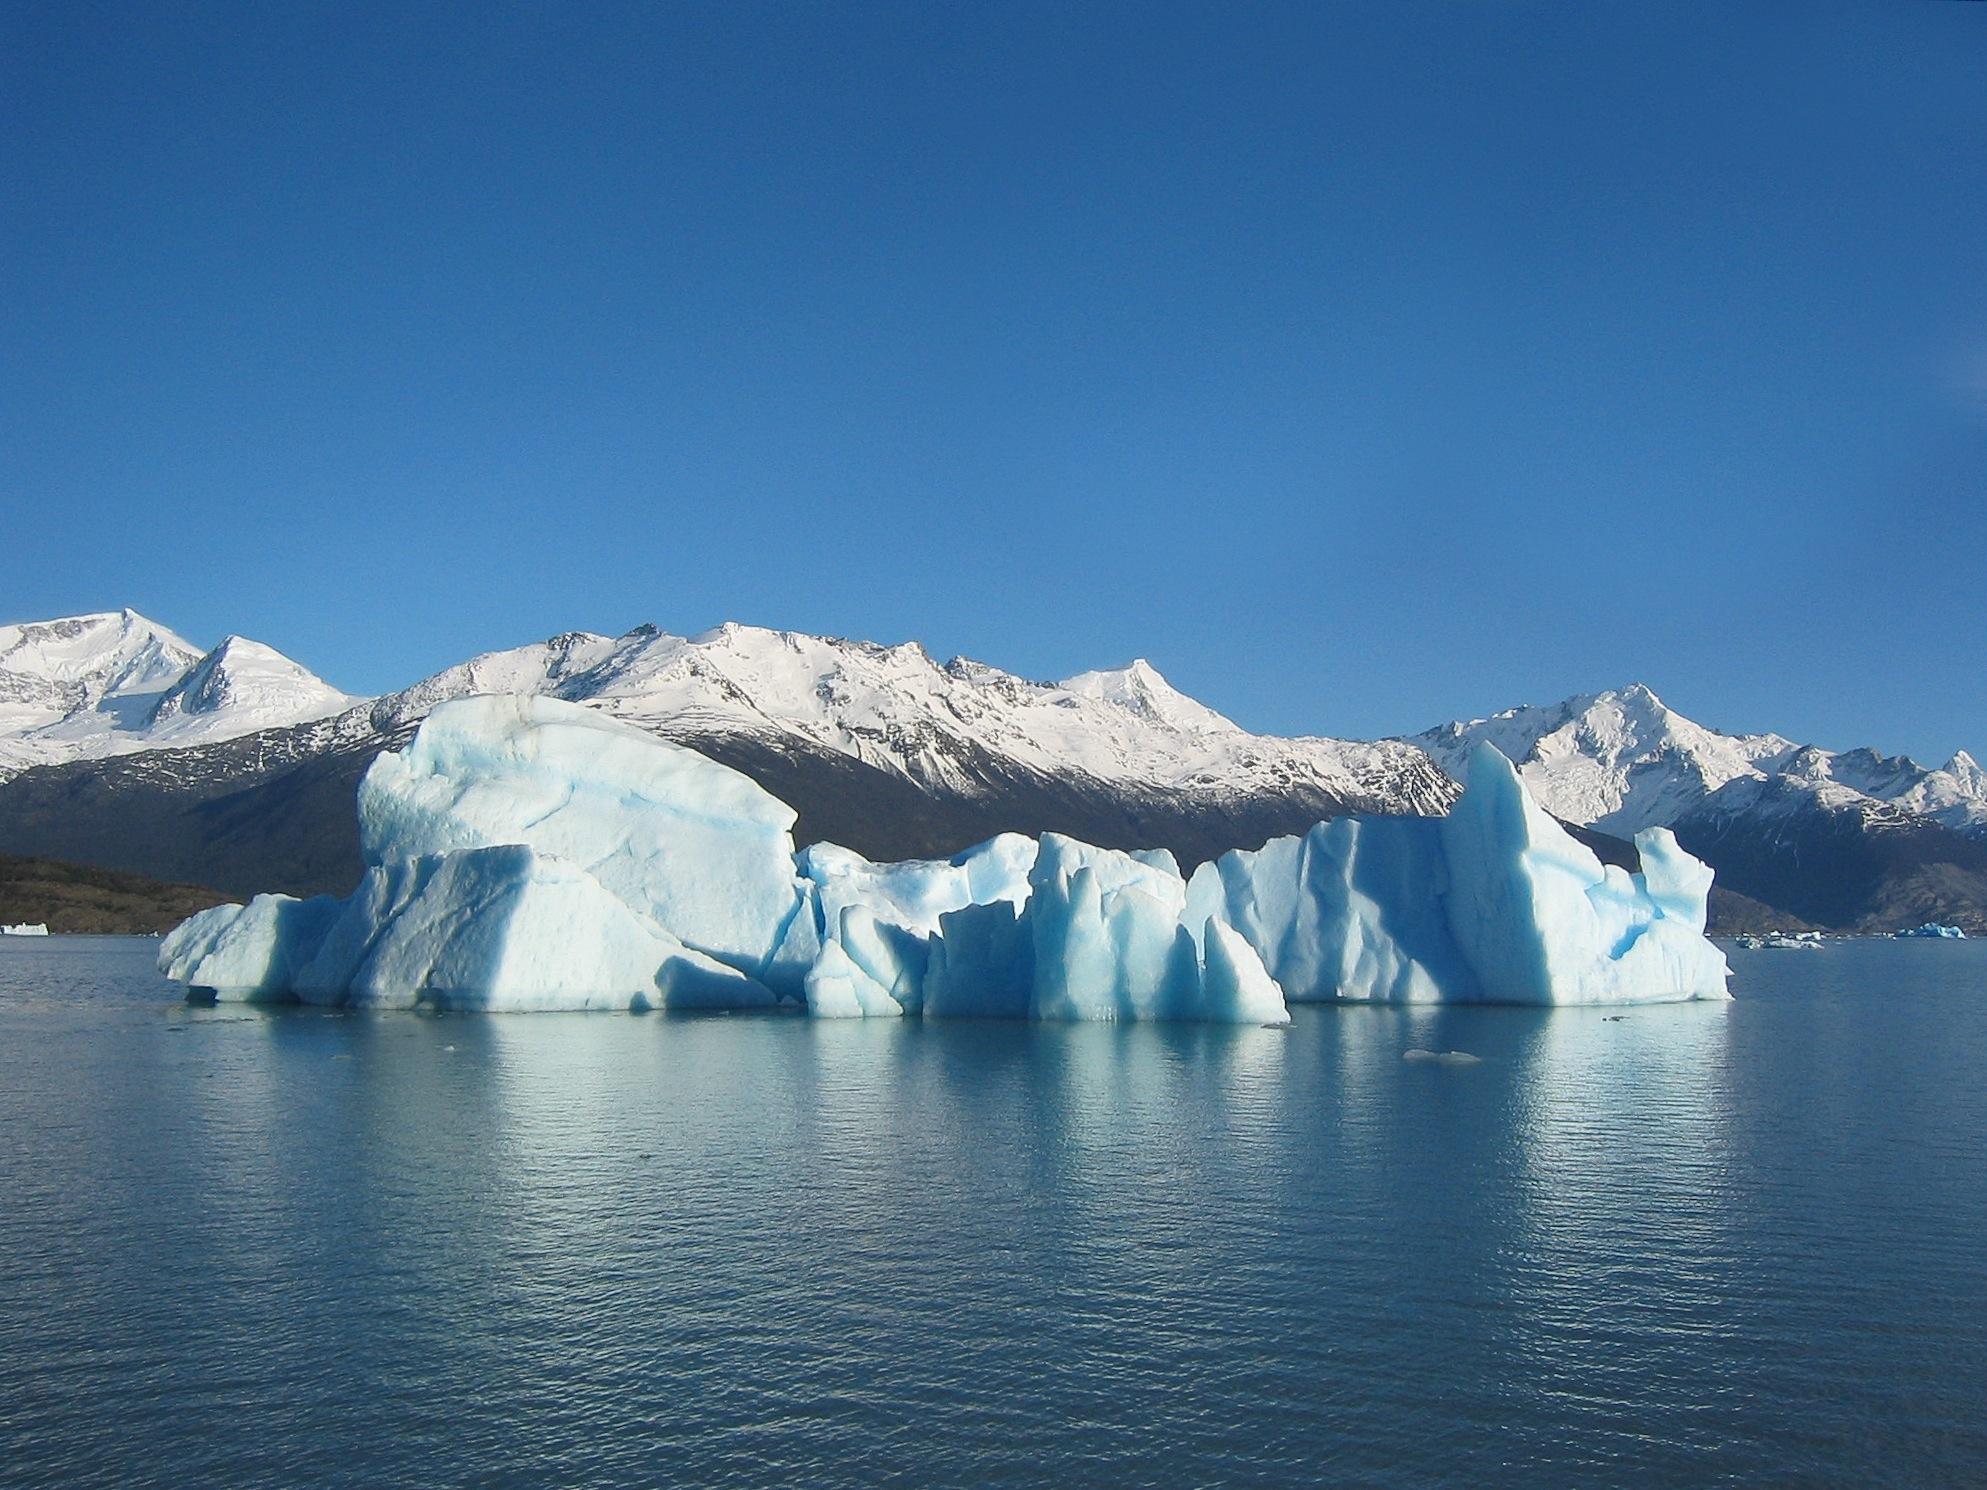 imagenes de iceberg